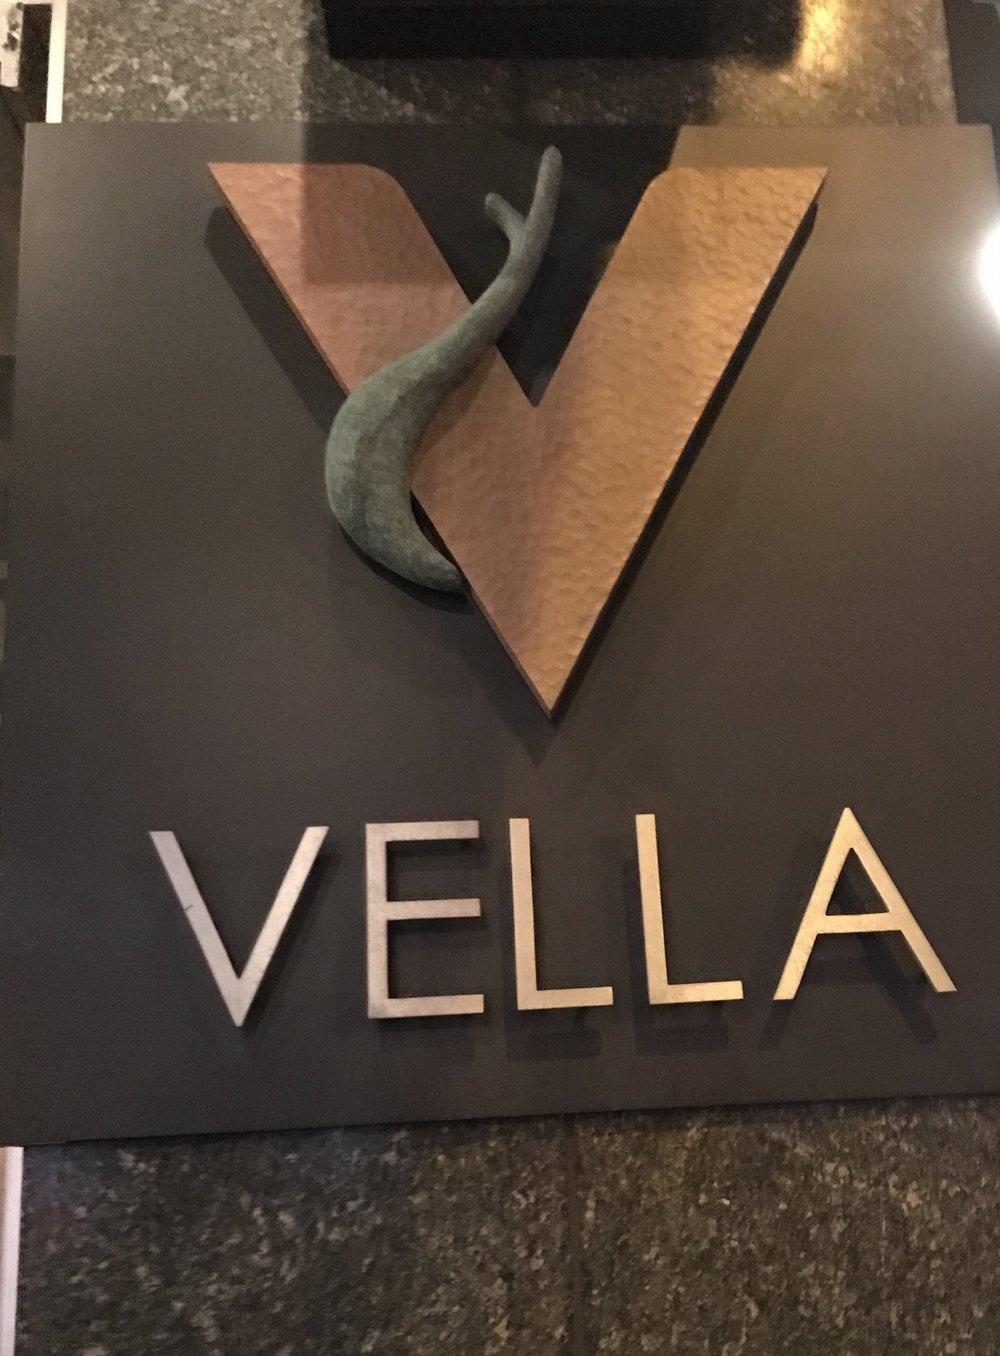 Vella, NYC